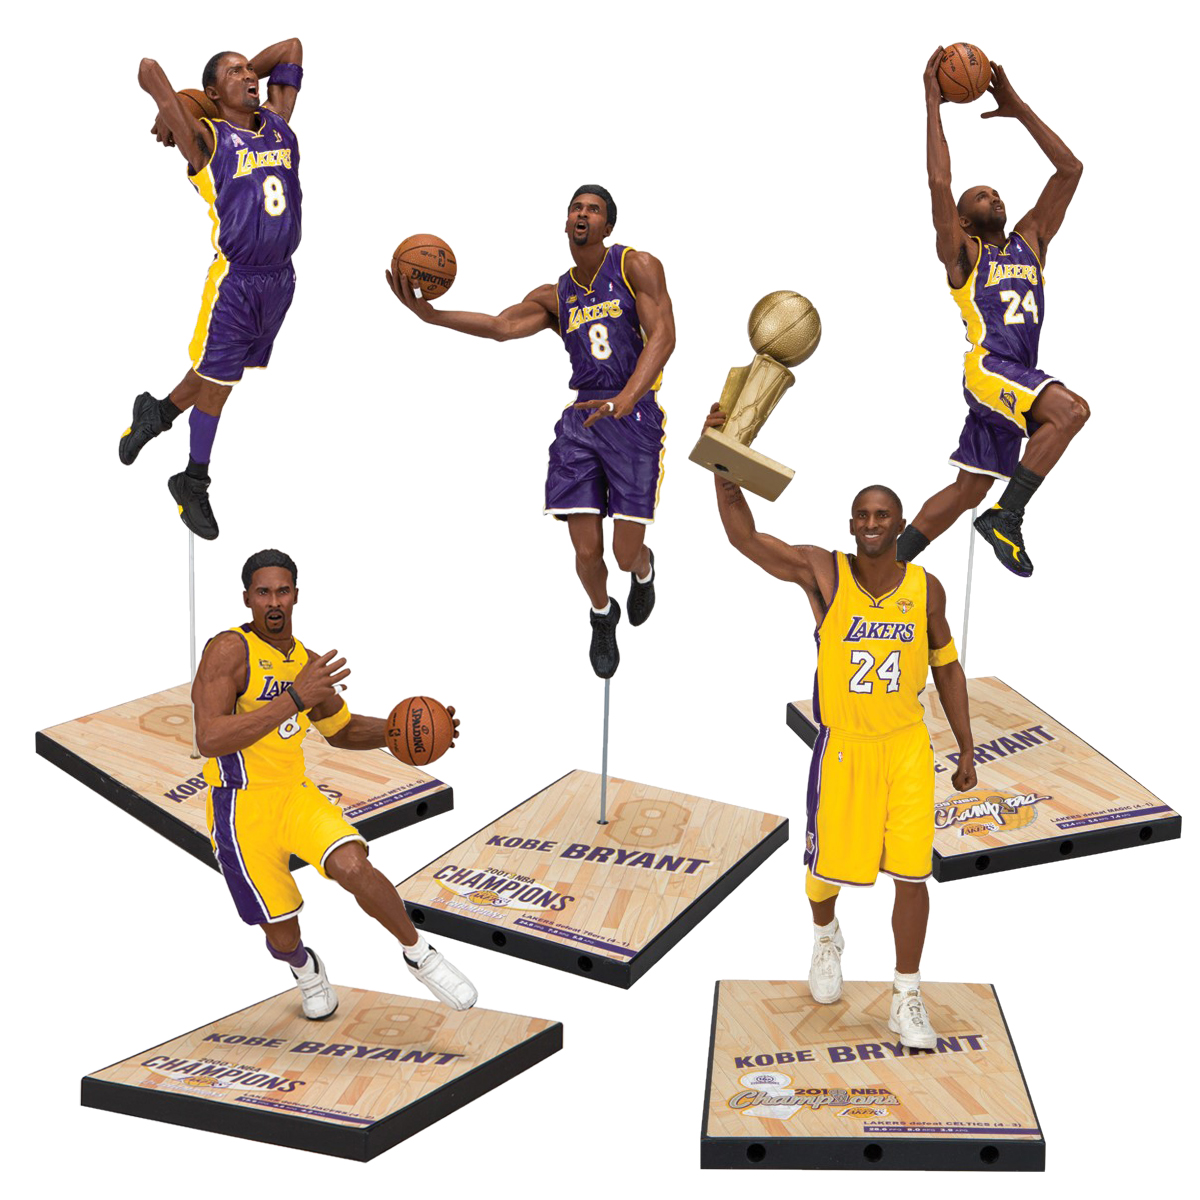 Mcfarlane Toys TMP/NBA Series Kobe Bryant Champion Series 7inch Figure(5体set)(マクファーレントイズ TMP/ NBA シリーズ: コービー・ブライアント チャンピオンシリーズ 7インチ フィギュア: 5種セット)17FW-I